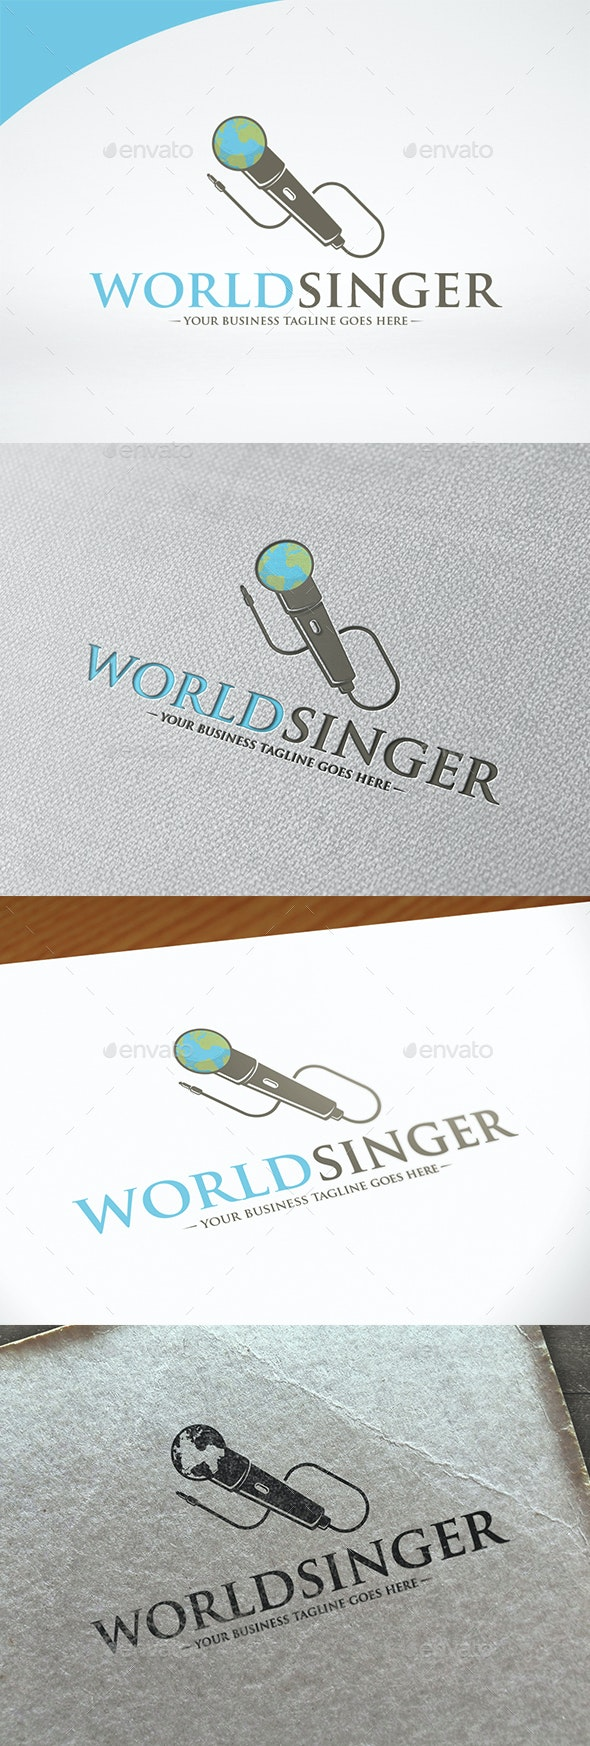 World Singer Logo Template - Objects Logo Templates